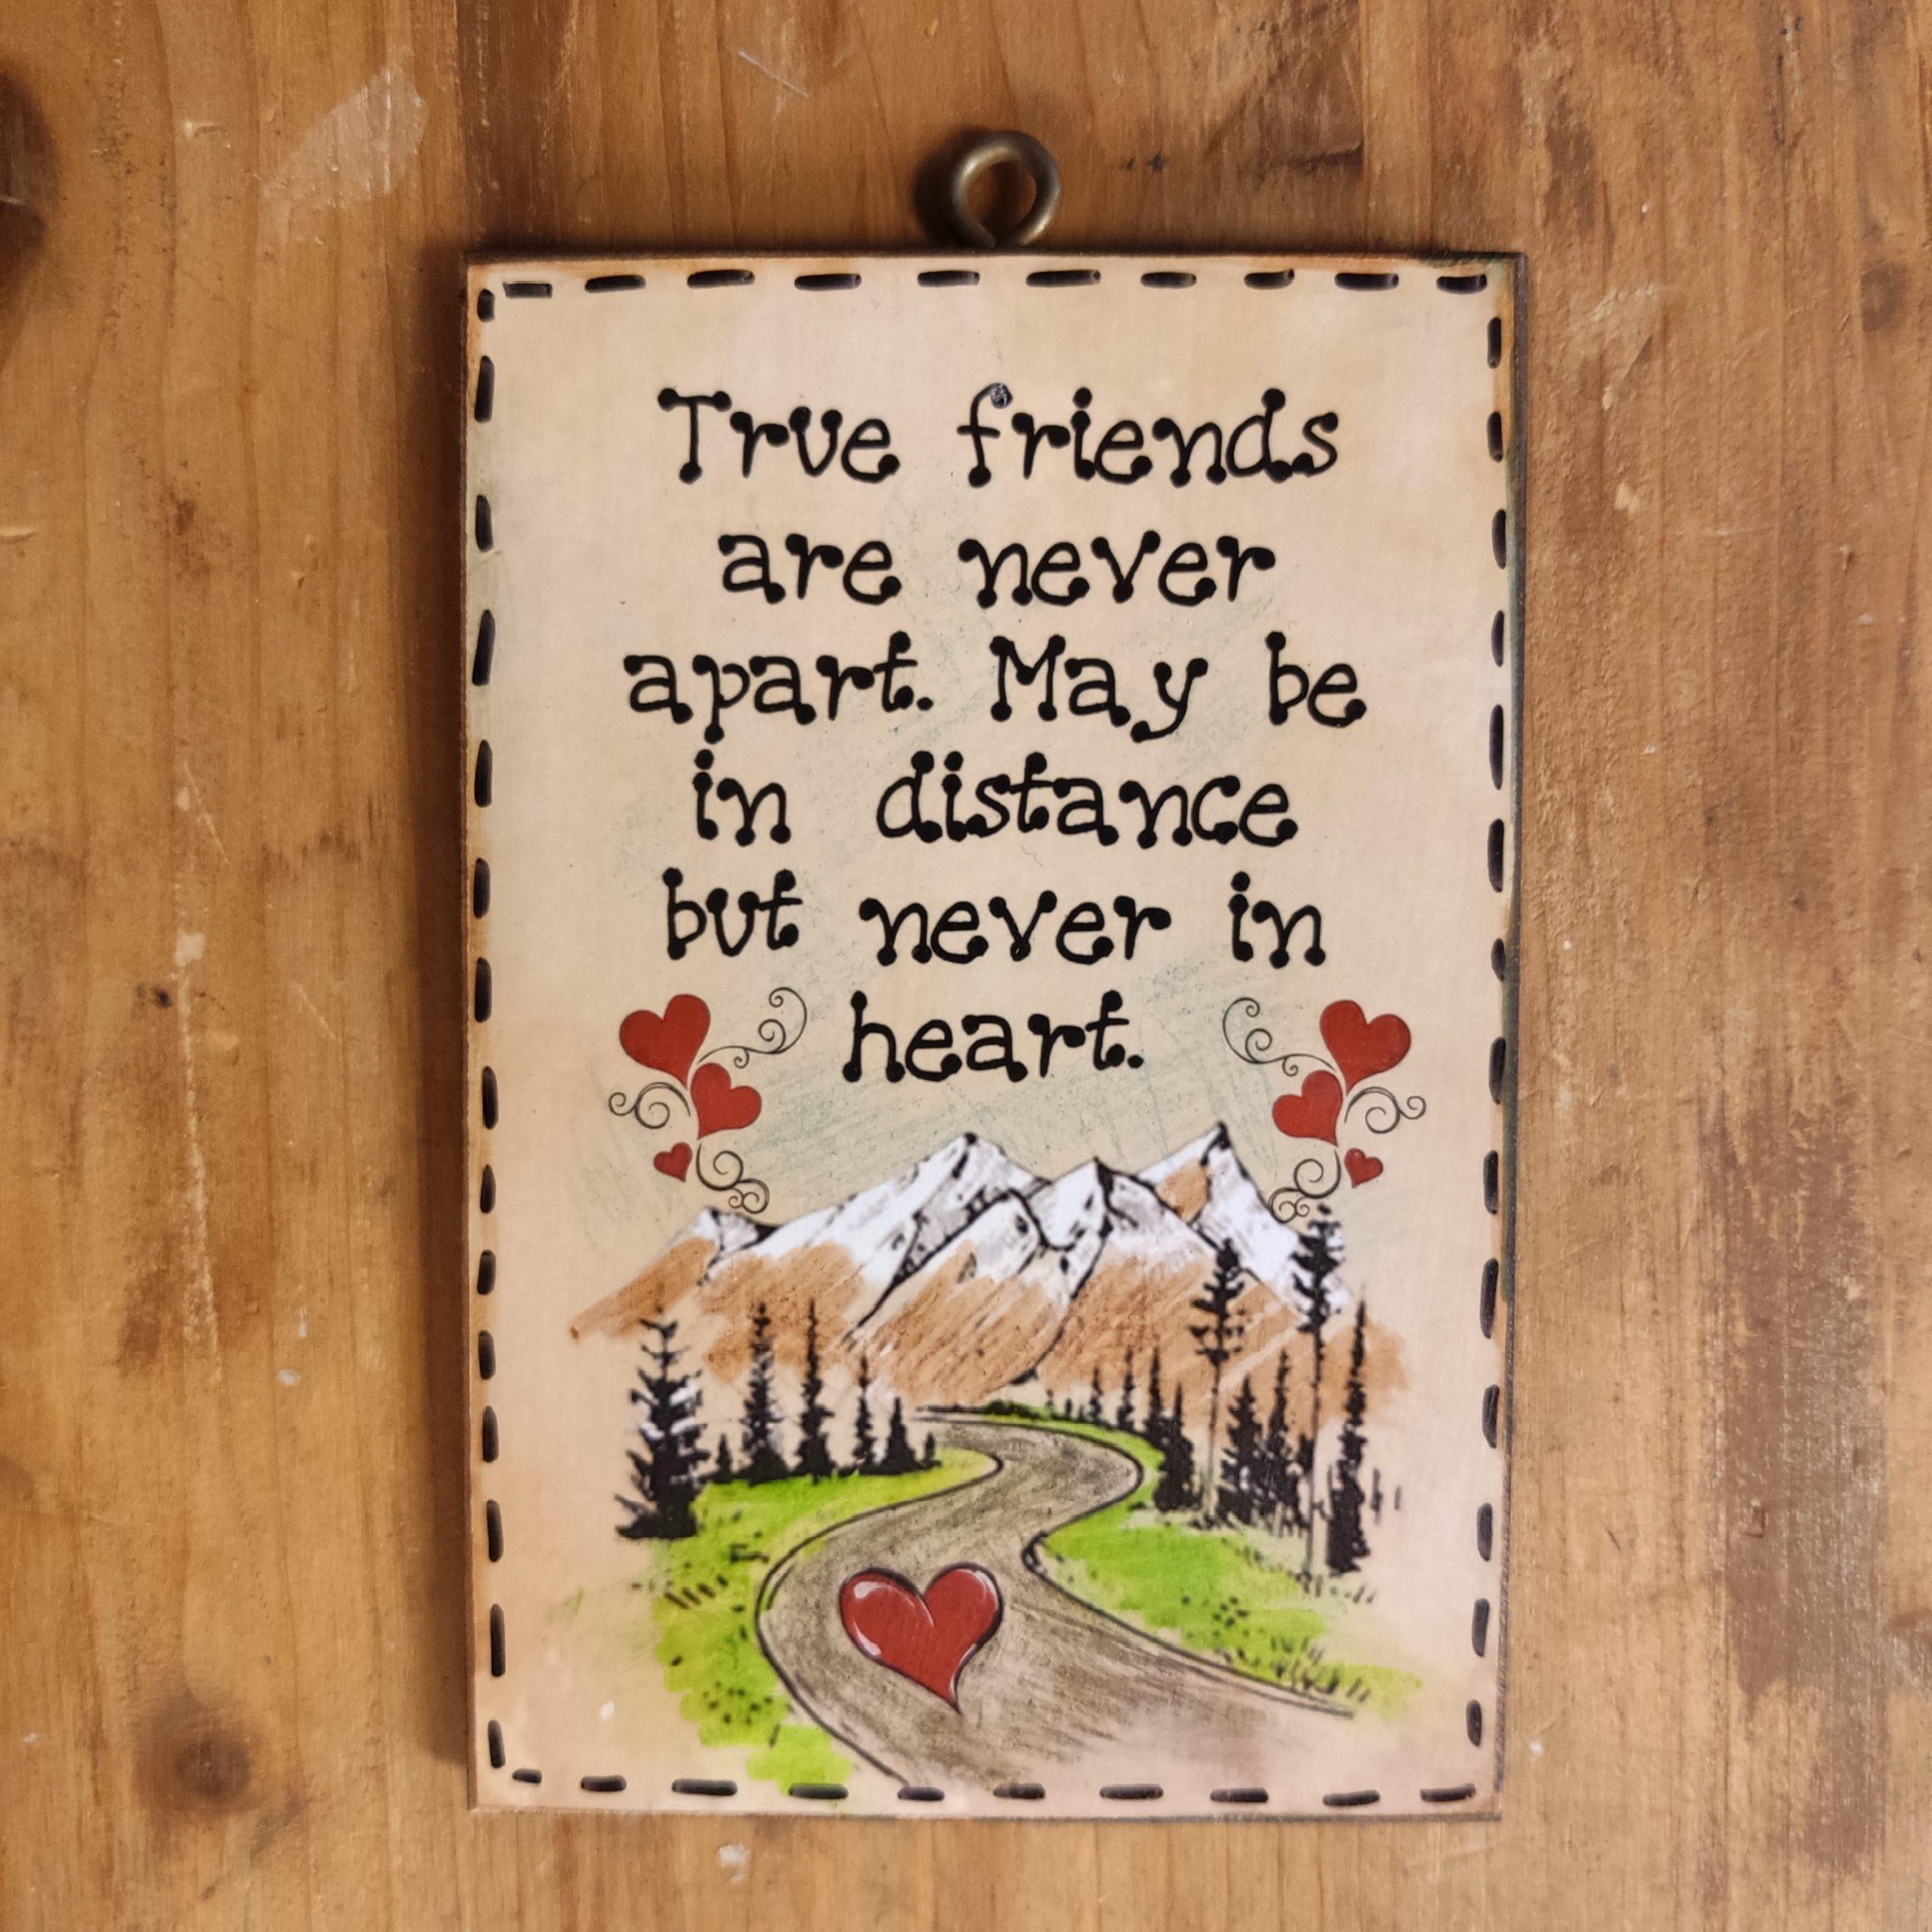 True friends…